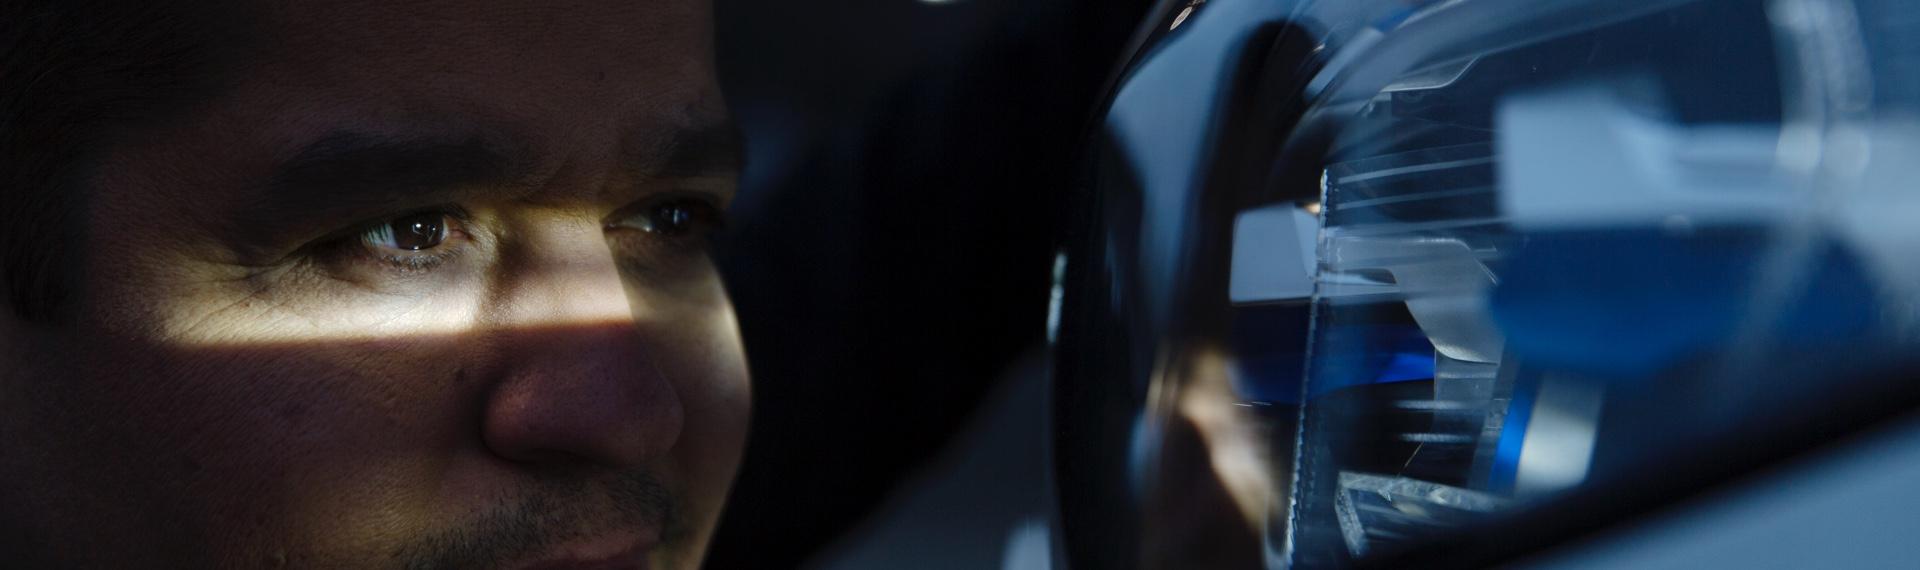 Dr. Hanafi looking into the BMW X7 Laserlight headlights